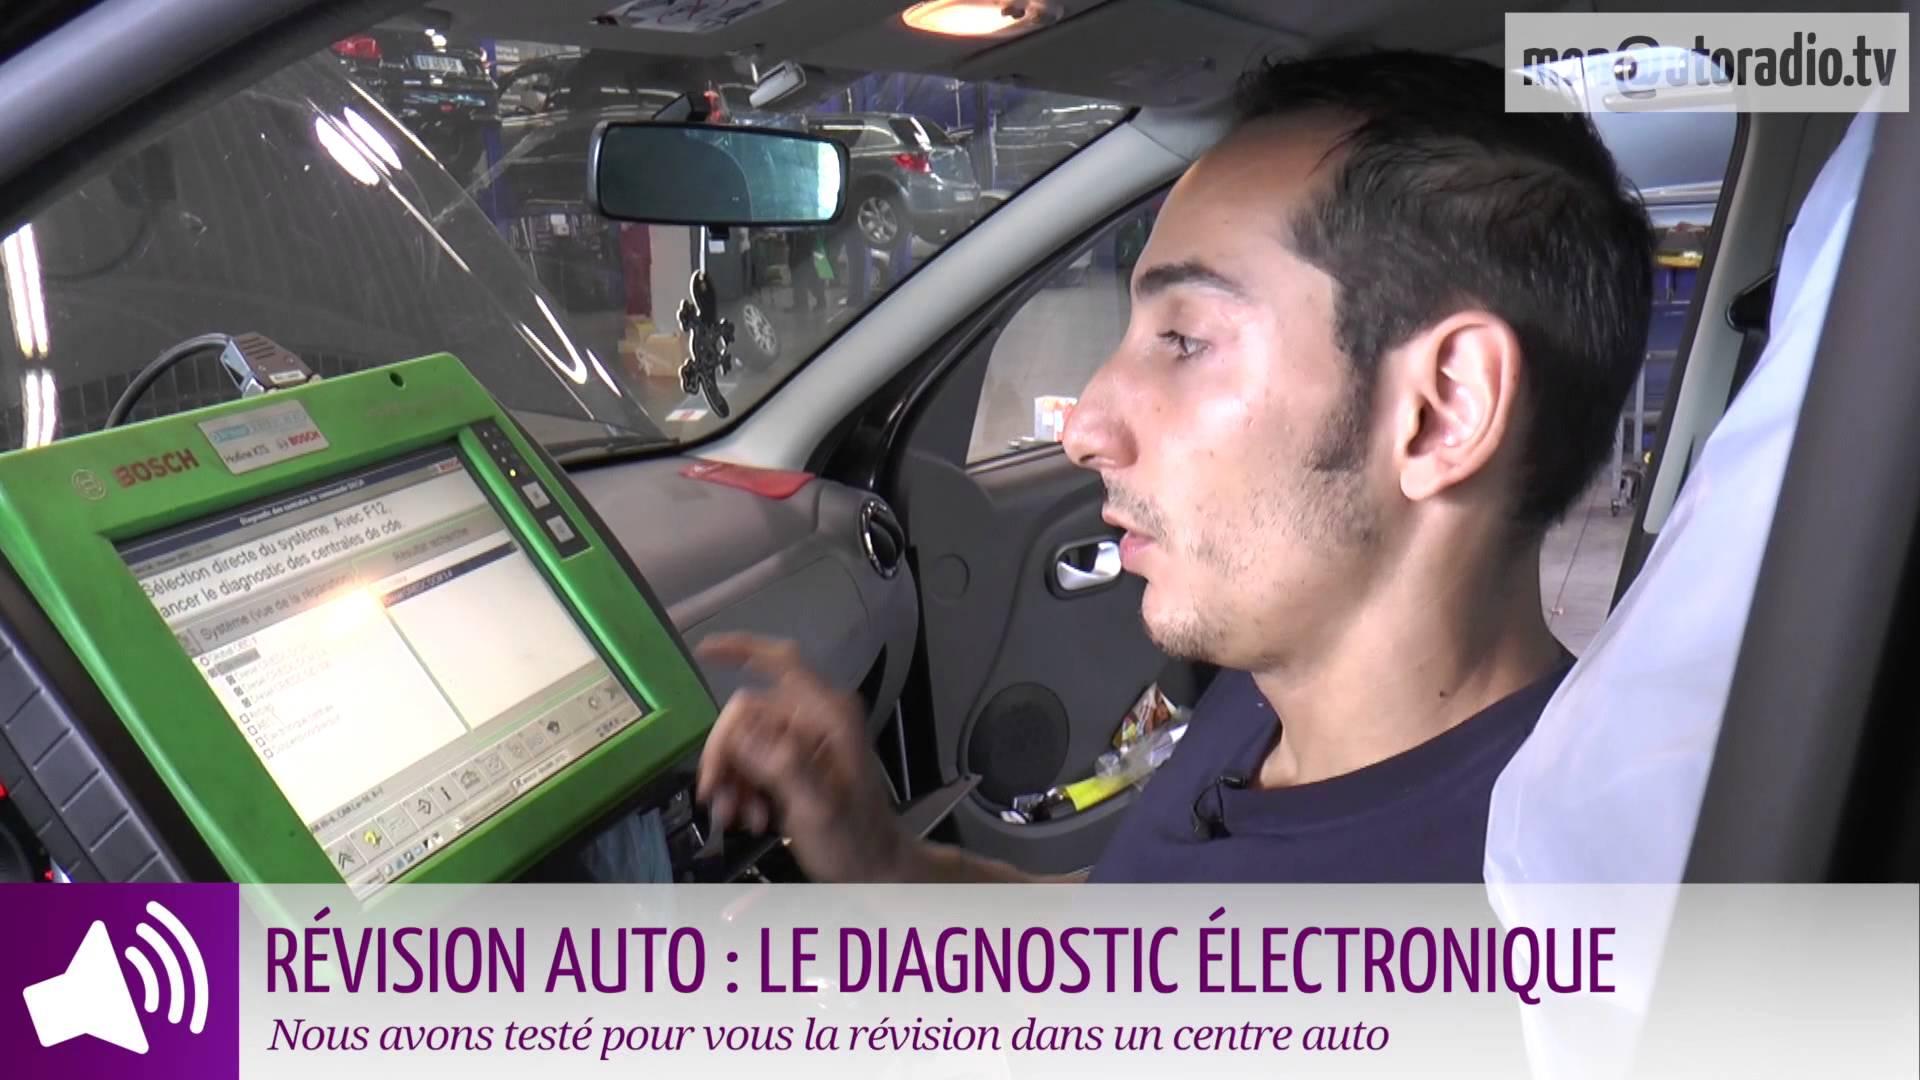 diagnostic electrique embarque automobile